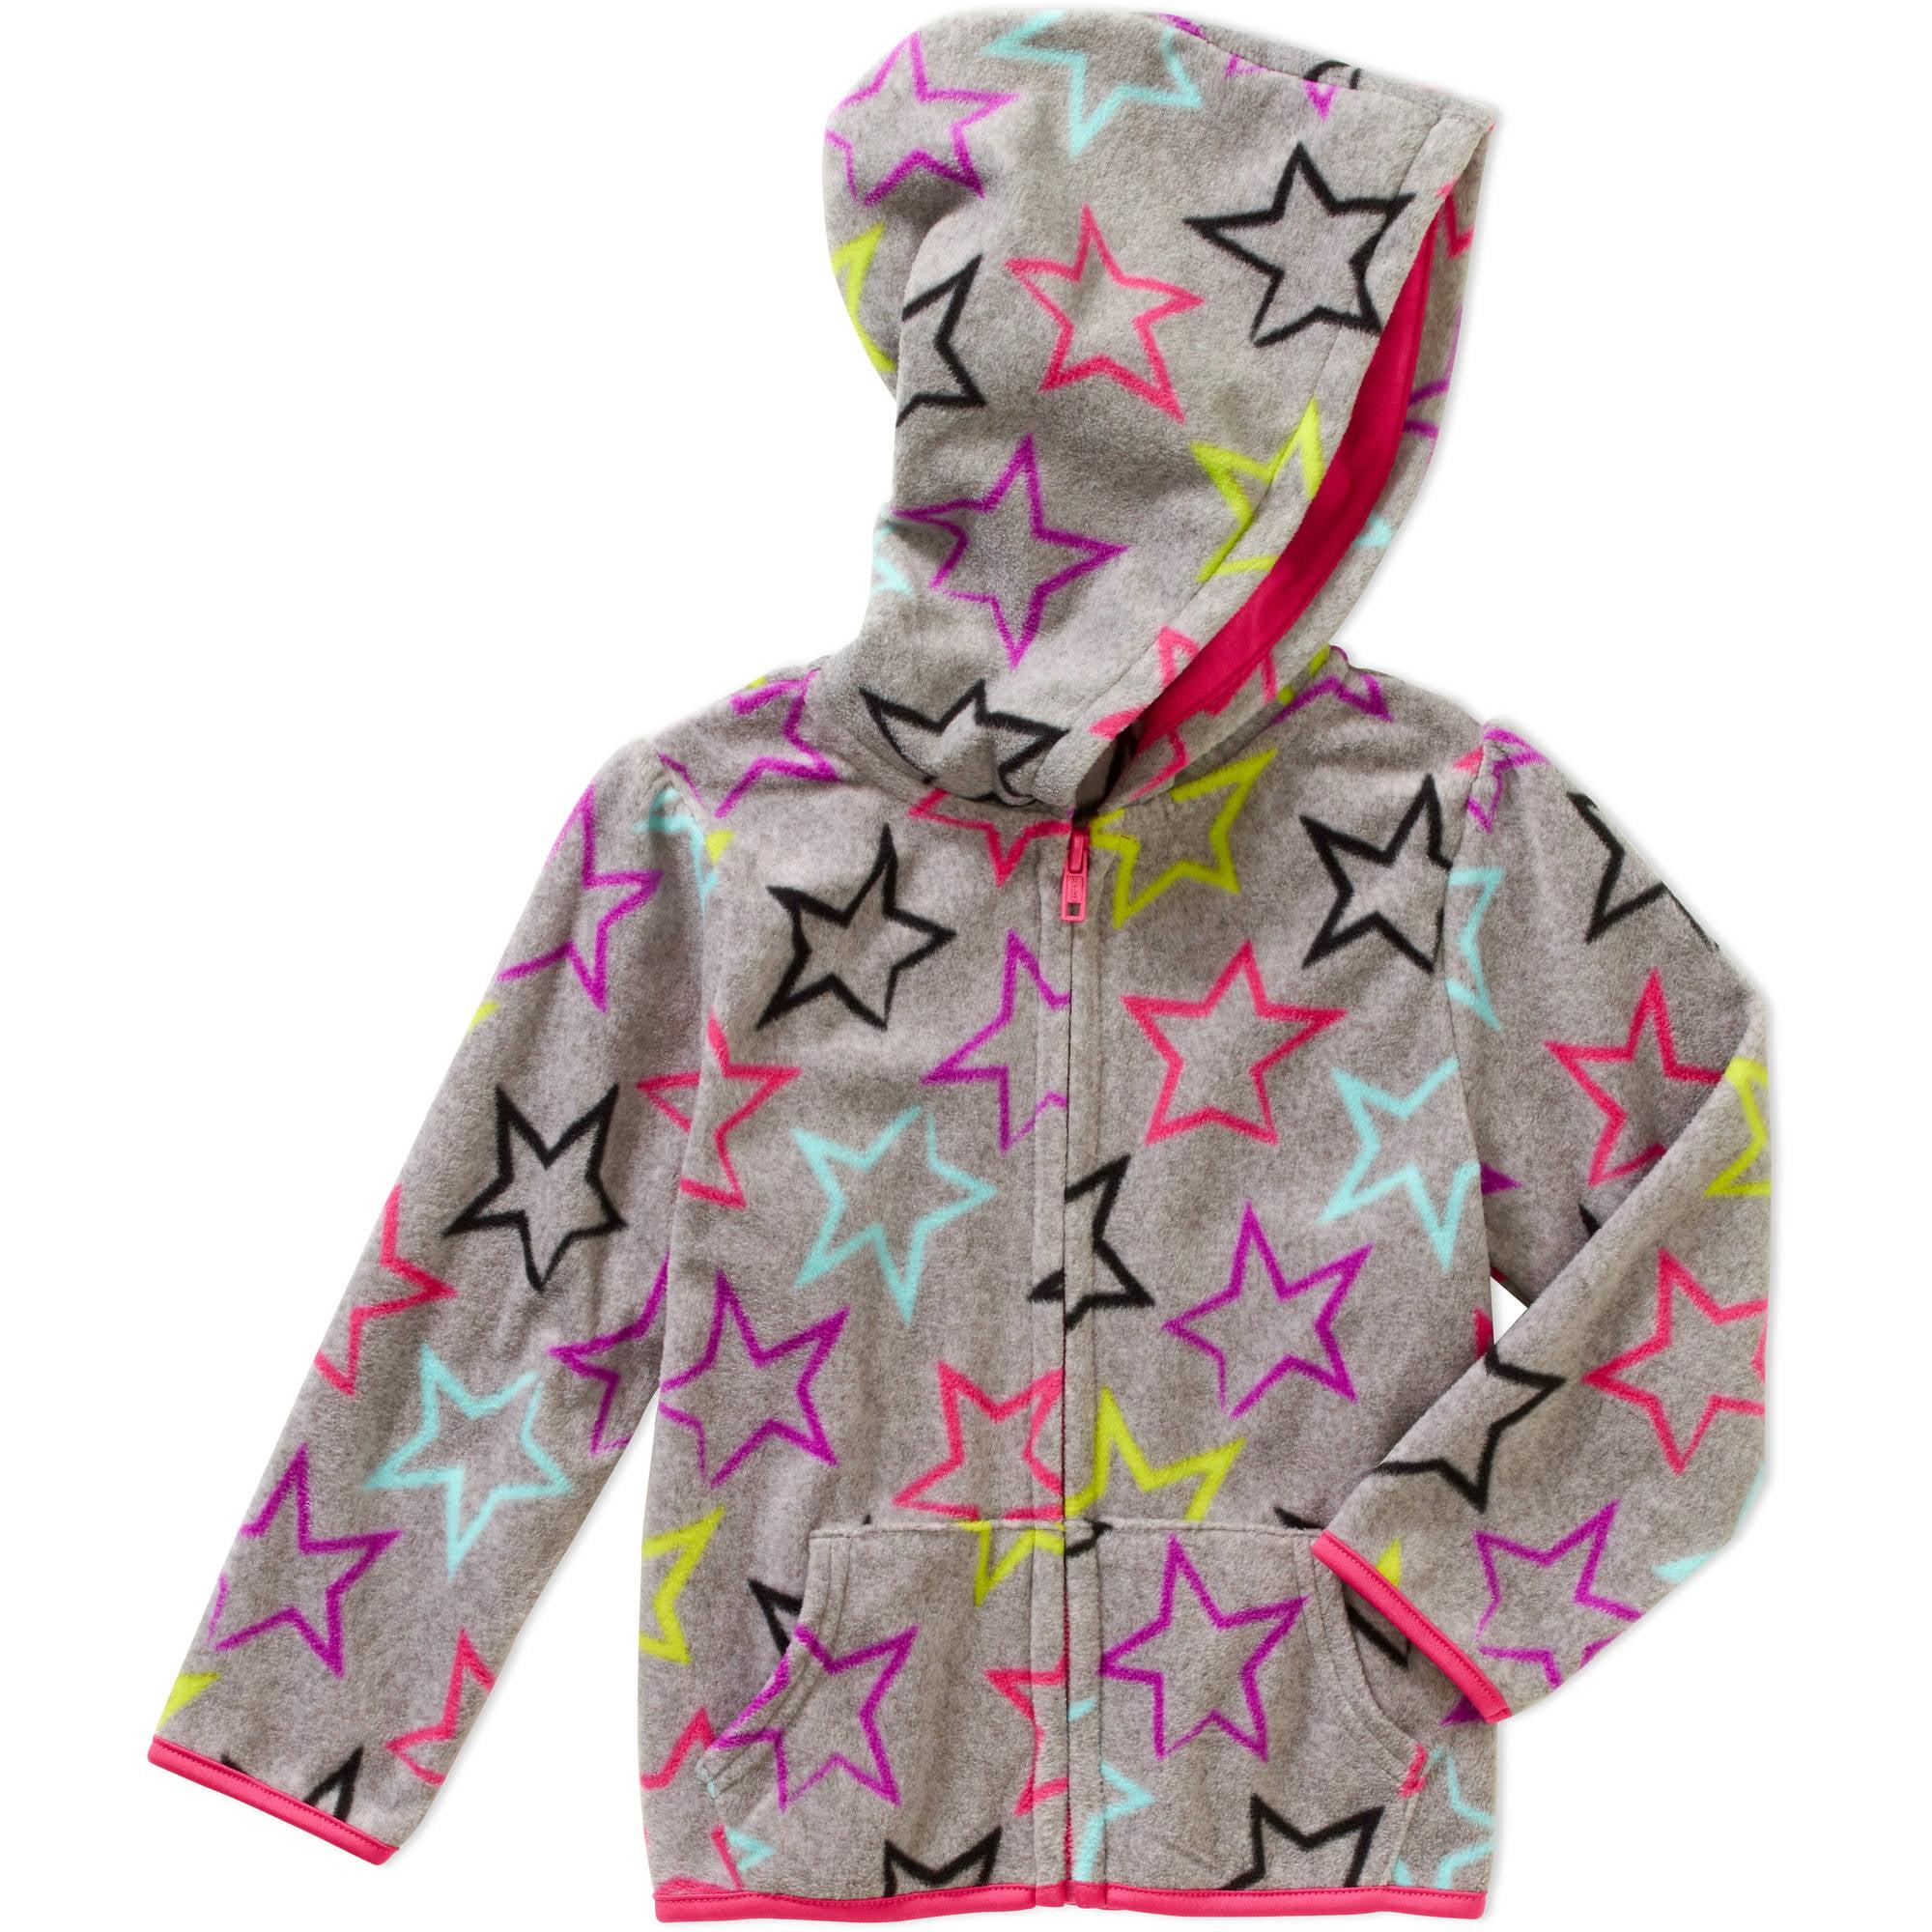 Garanimals Baby Toddler Girl Printed Fleece Hoodie Jacket